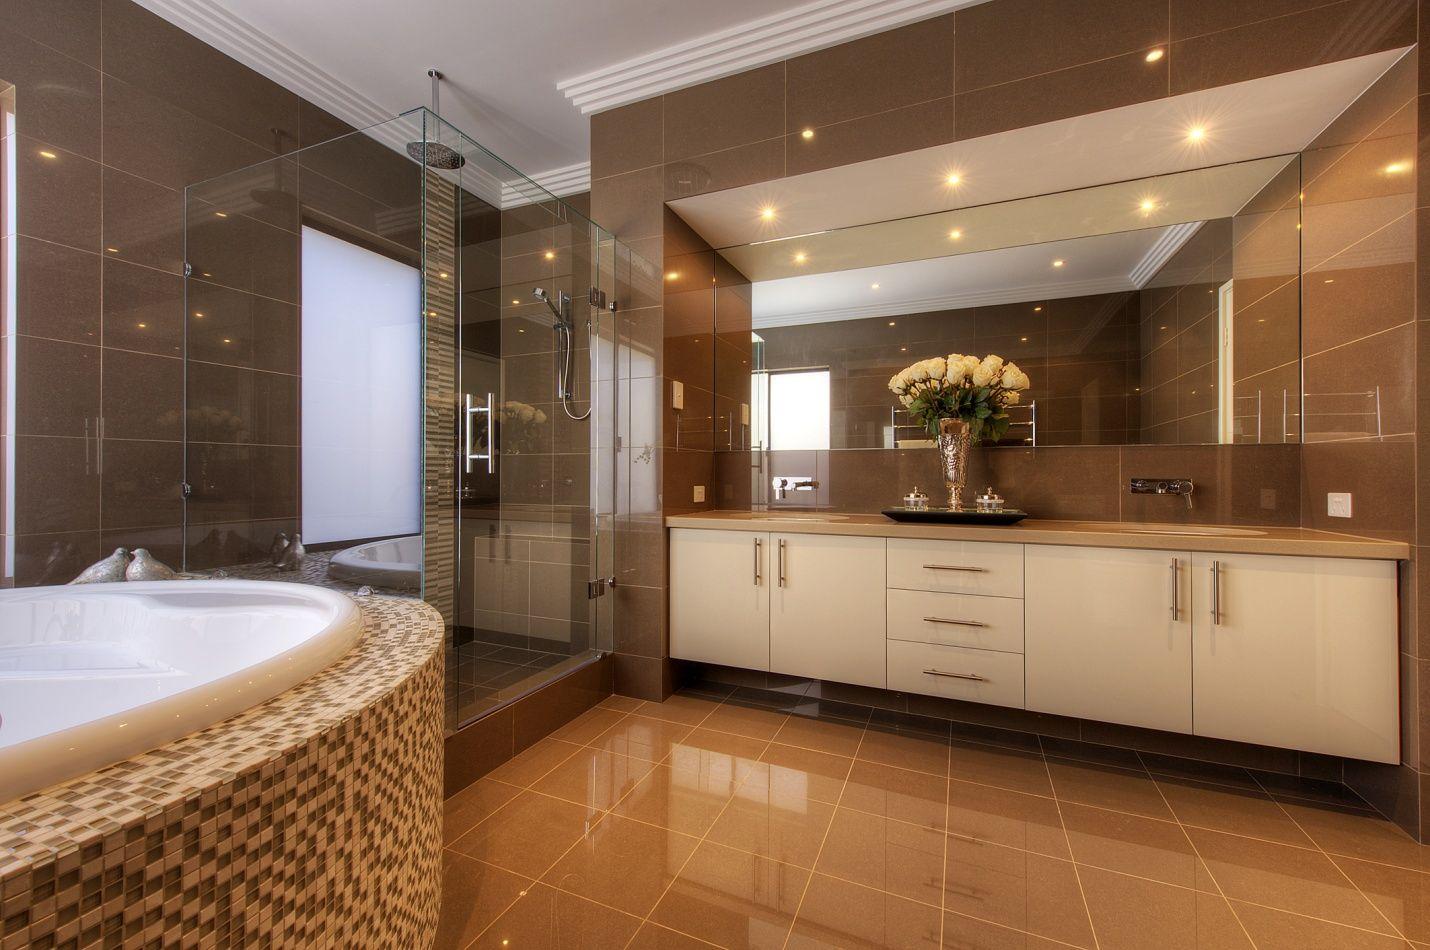 Top 10 Master Bathrooms Design Ideas For 2018  Bathroom Designs Best Top Bathroom Designs Design Ideas